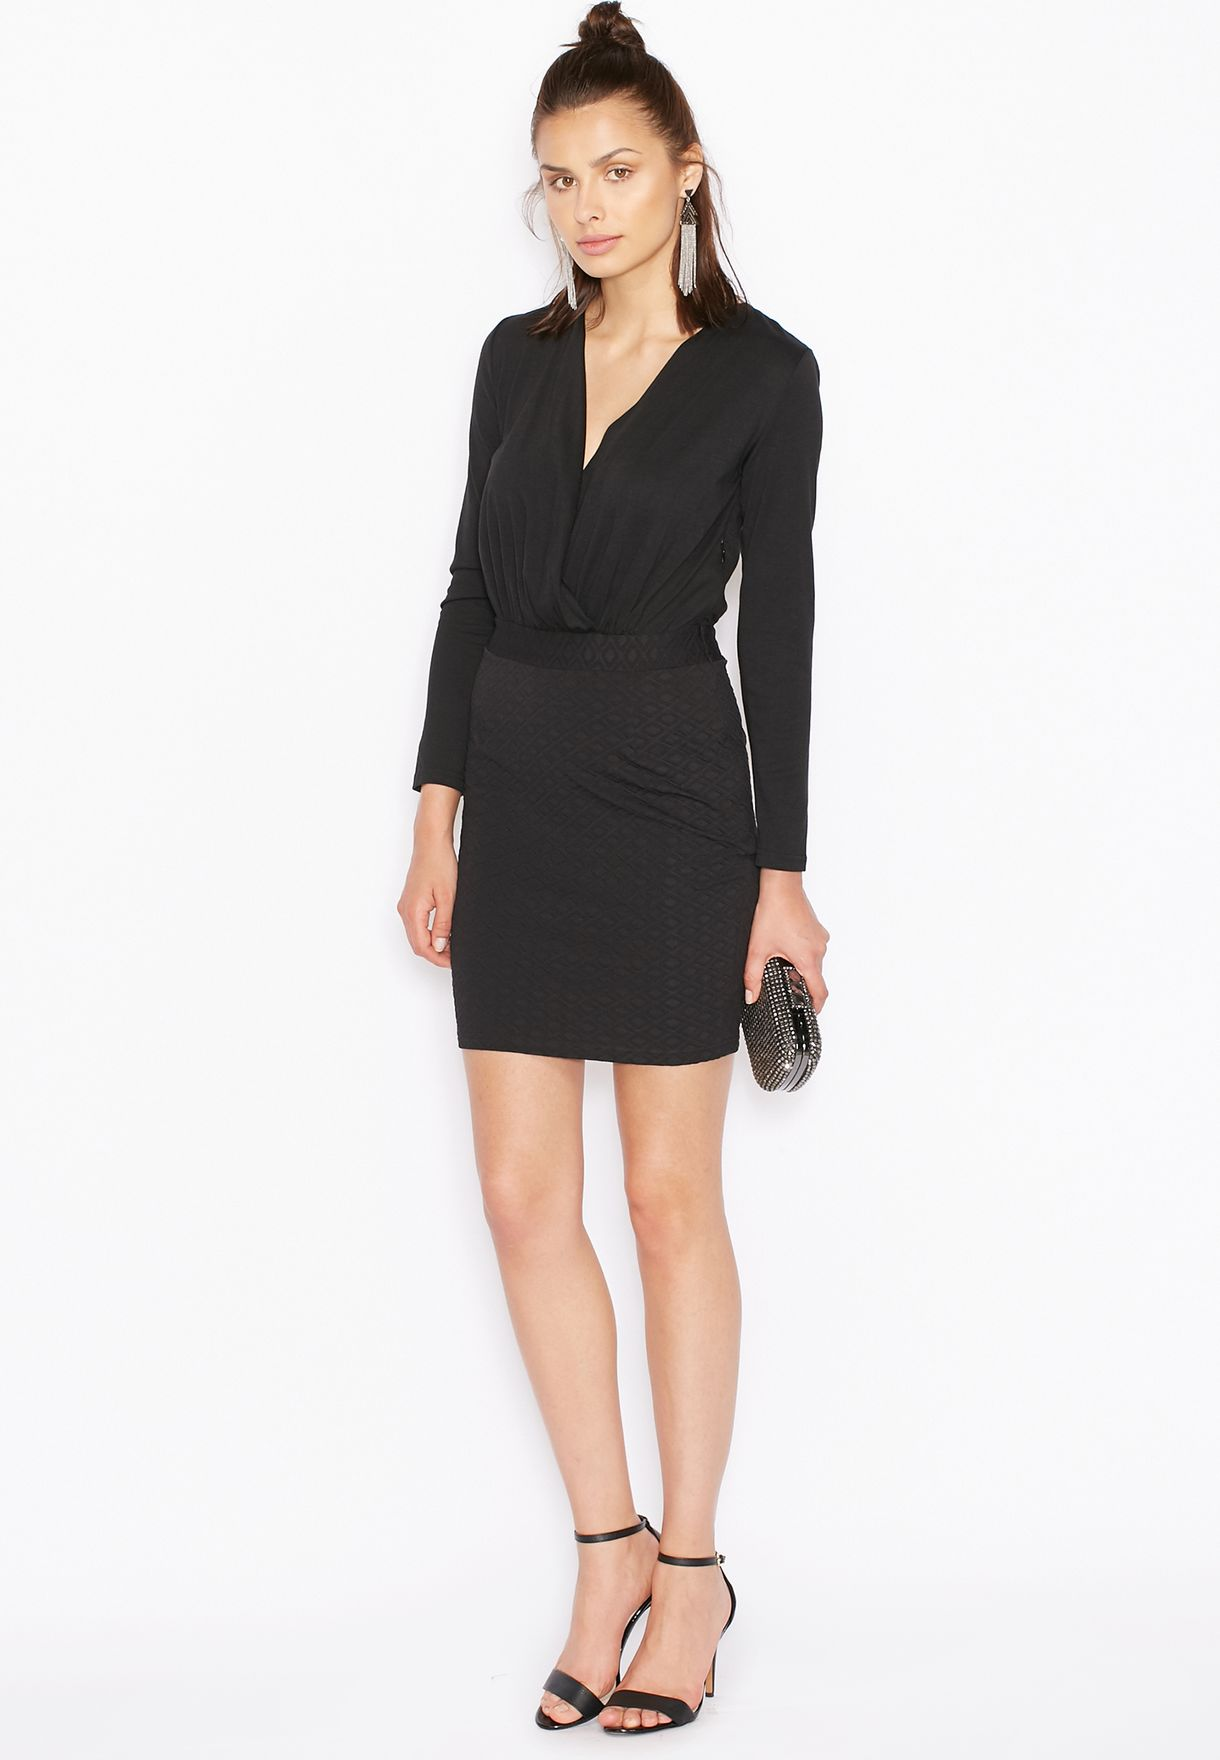 e6c611478ed2f تسوق فستان لف ماركة جينجر لون أسود في الامارات - GI121AT23SIQ